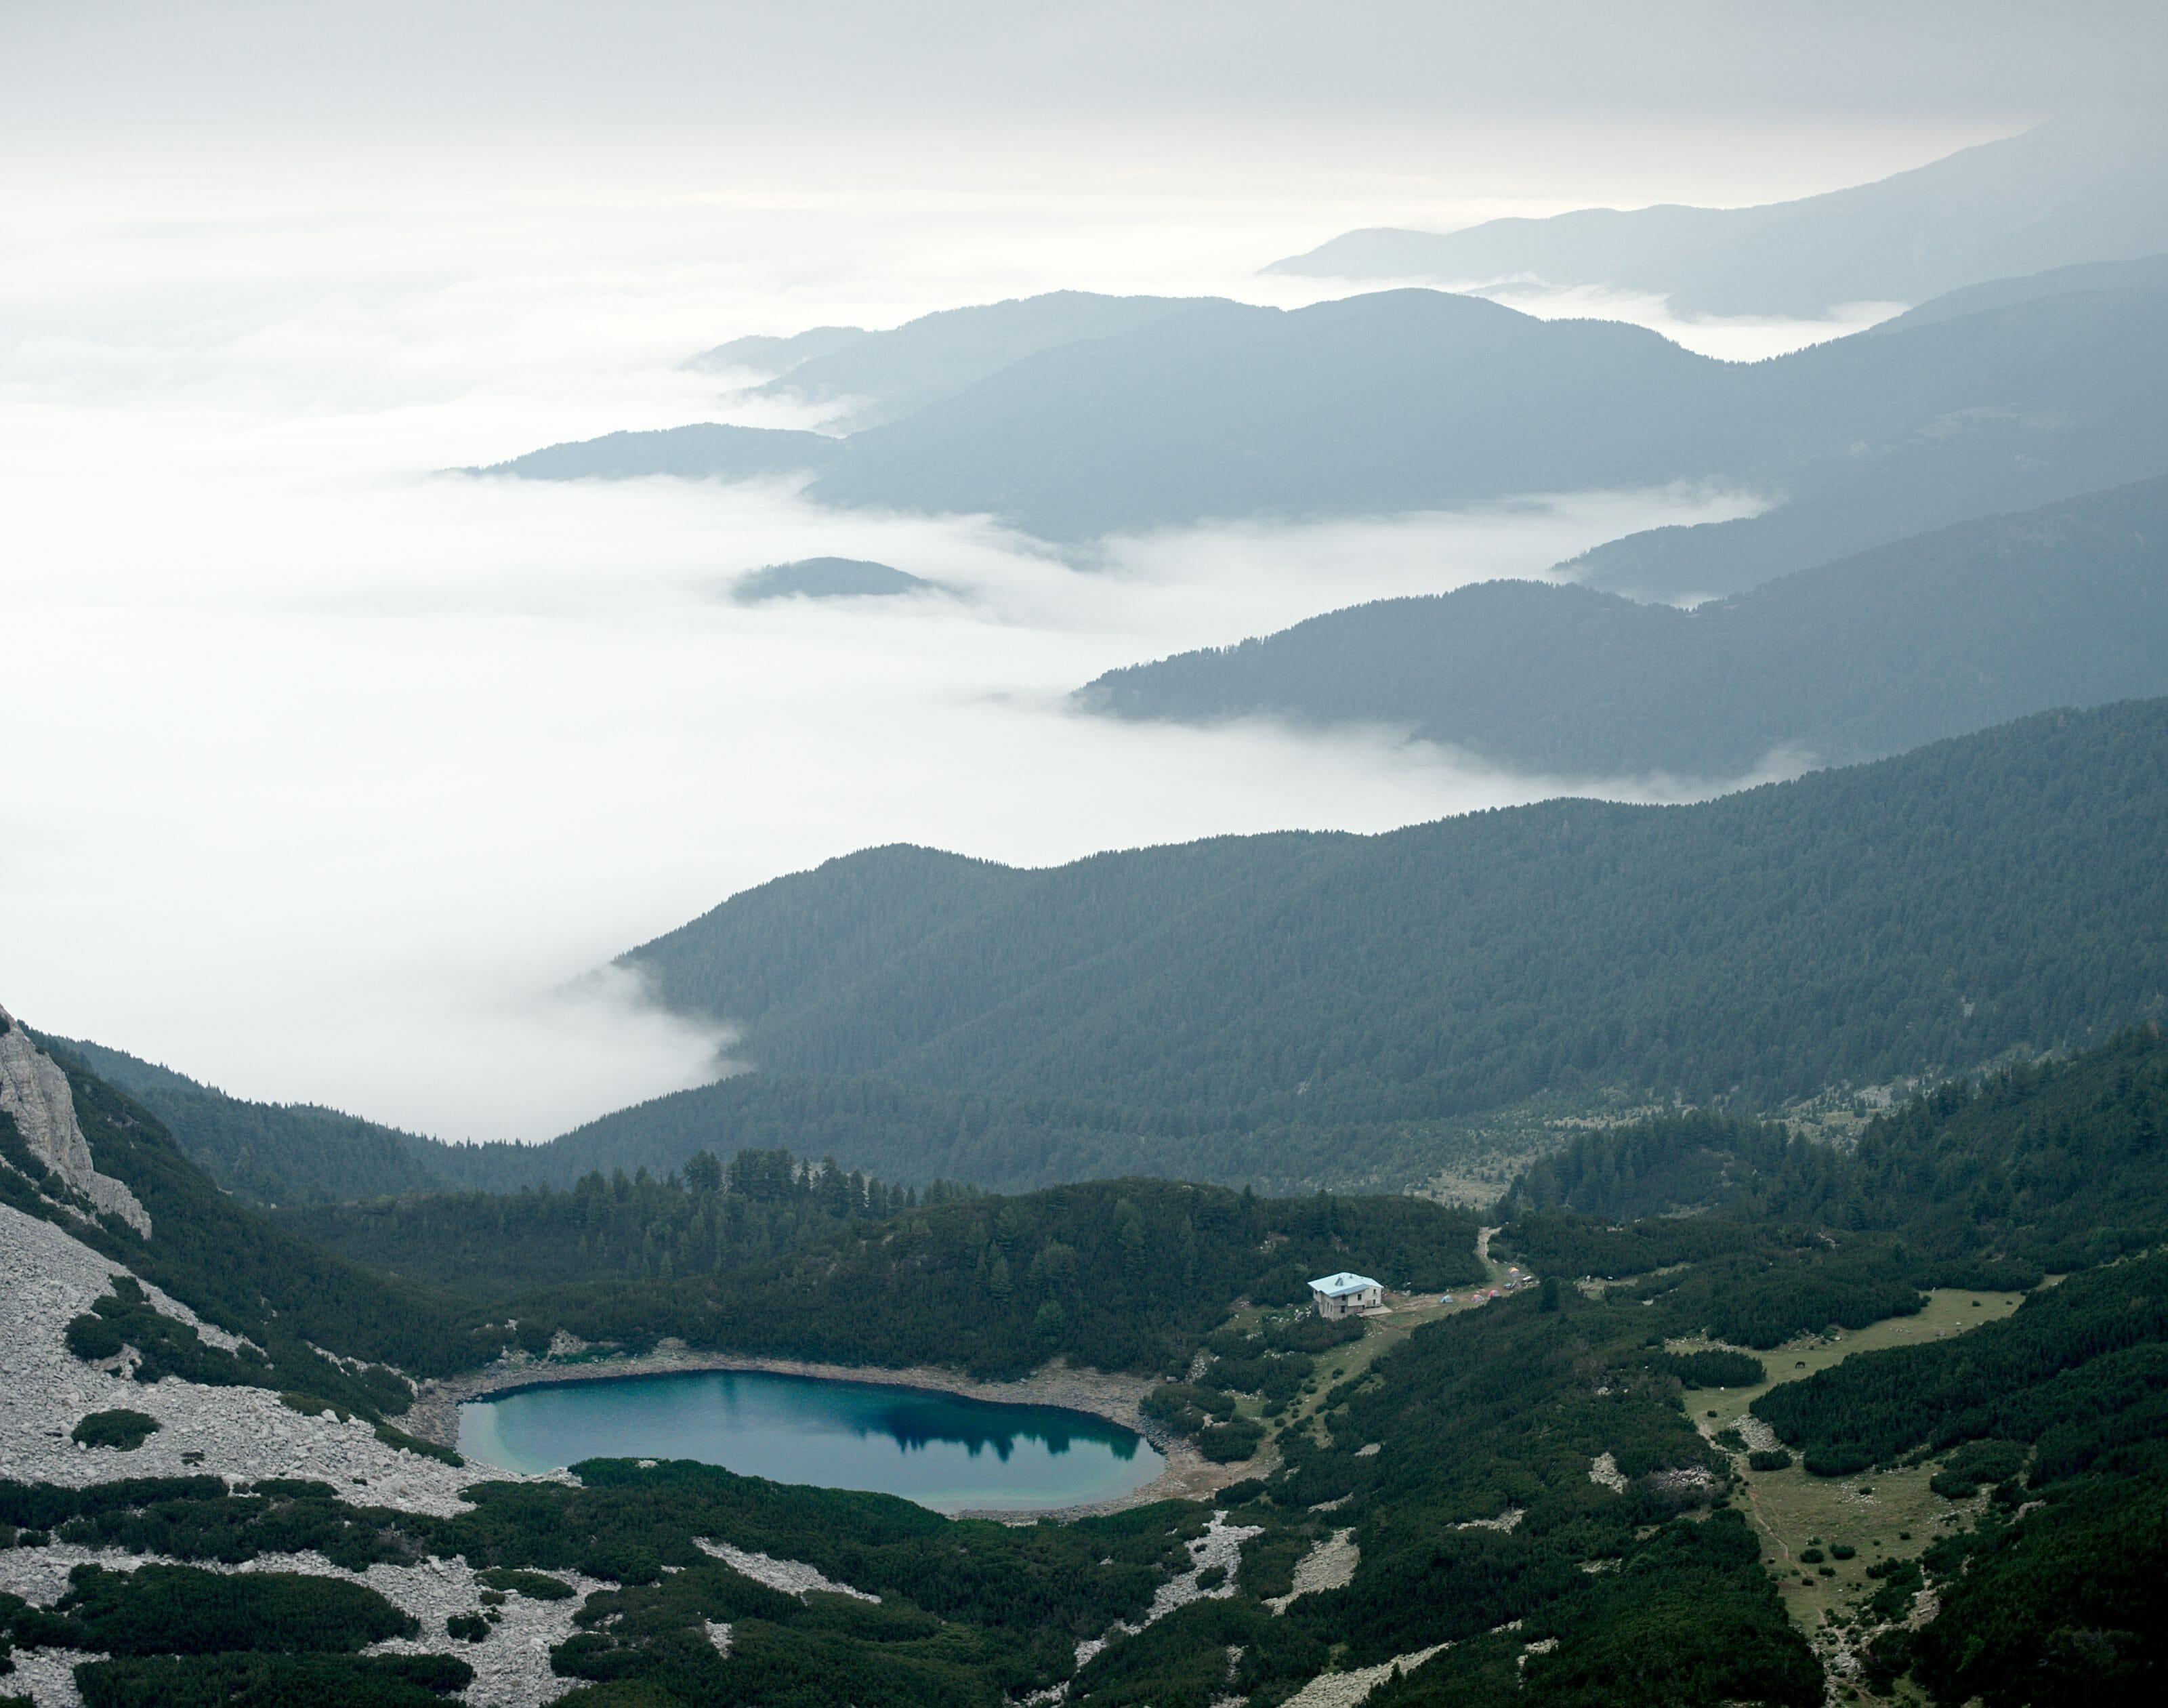 mer de nuage en montagne